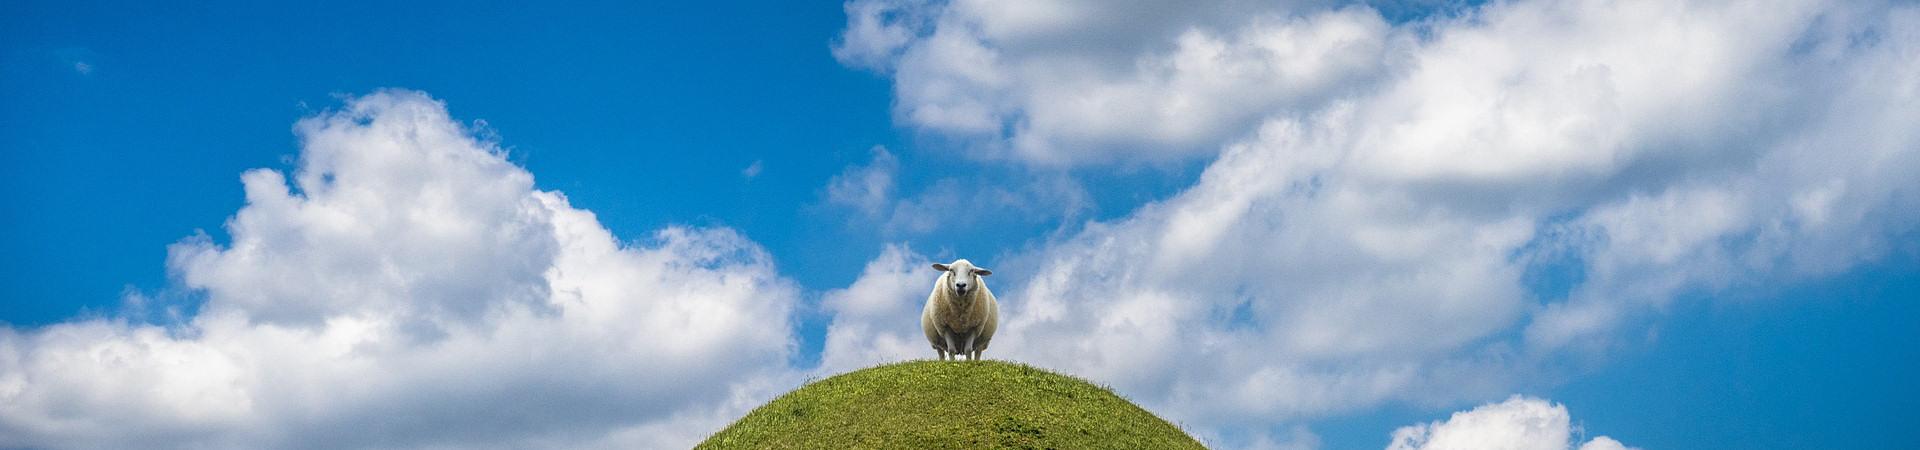 sheep_test